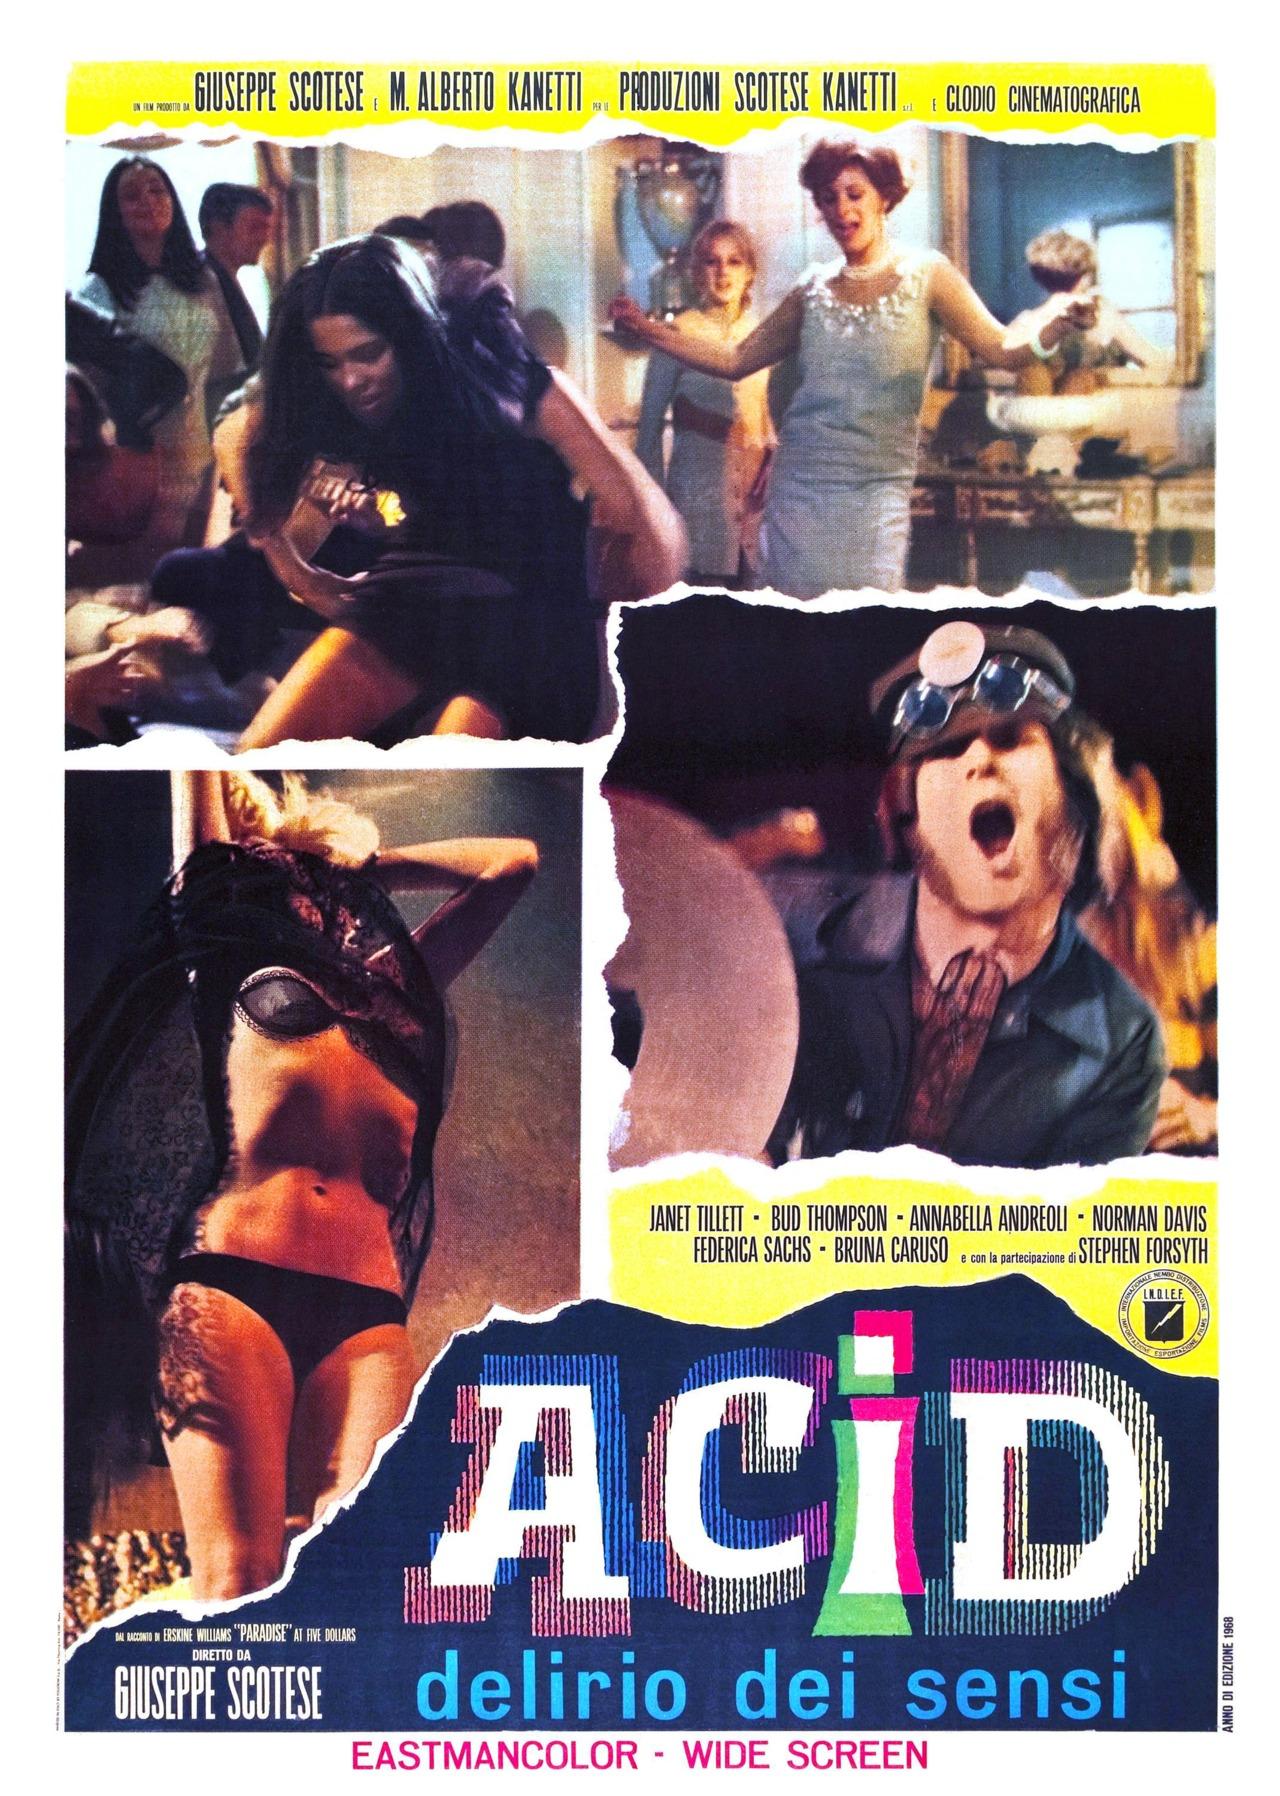 Acid: Delirio Dei Sensi    http://bit.ly/H0KEhp  (Via @dangerousmindsblog) #PosterSwooon